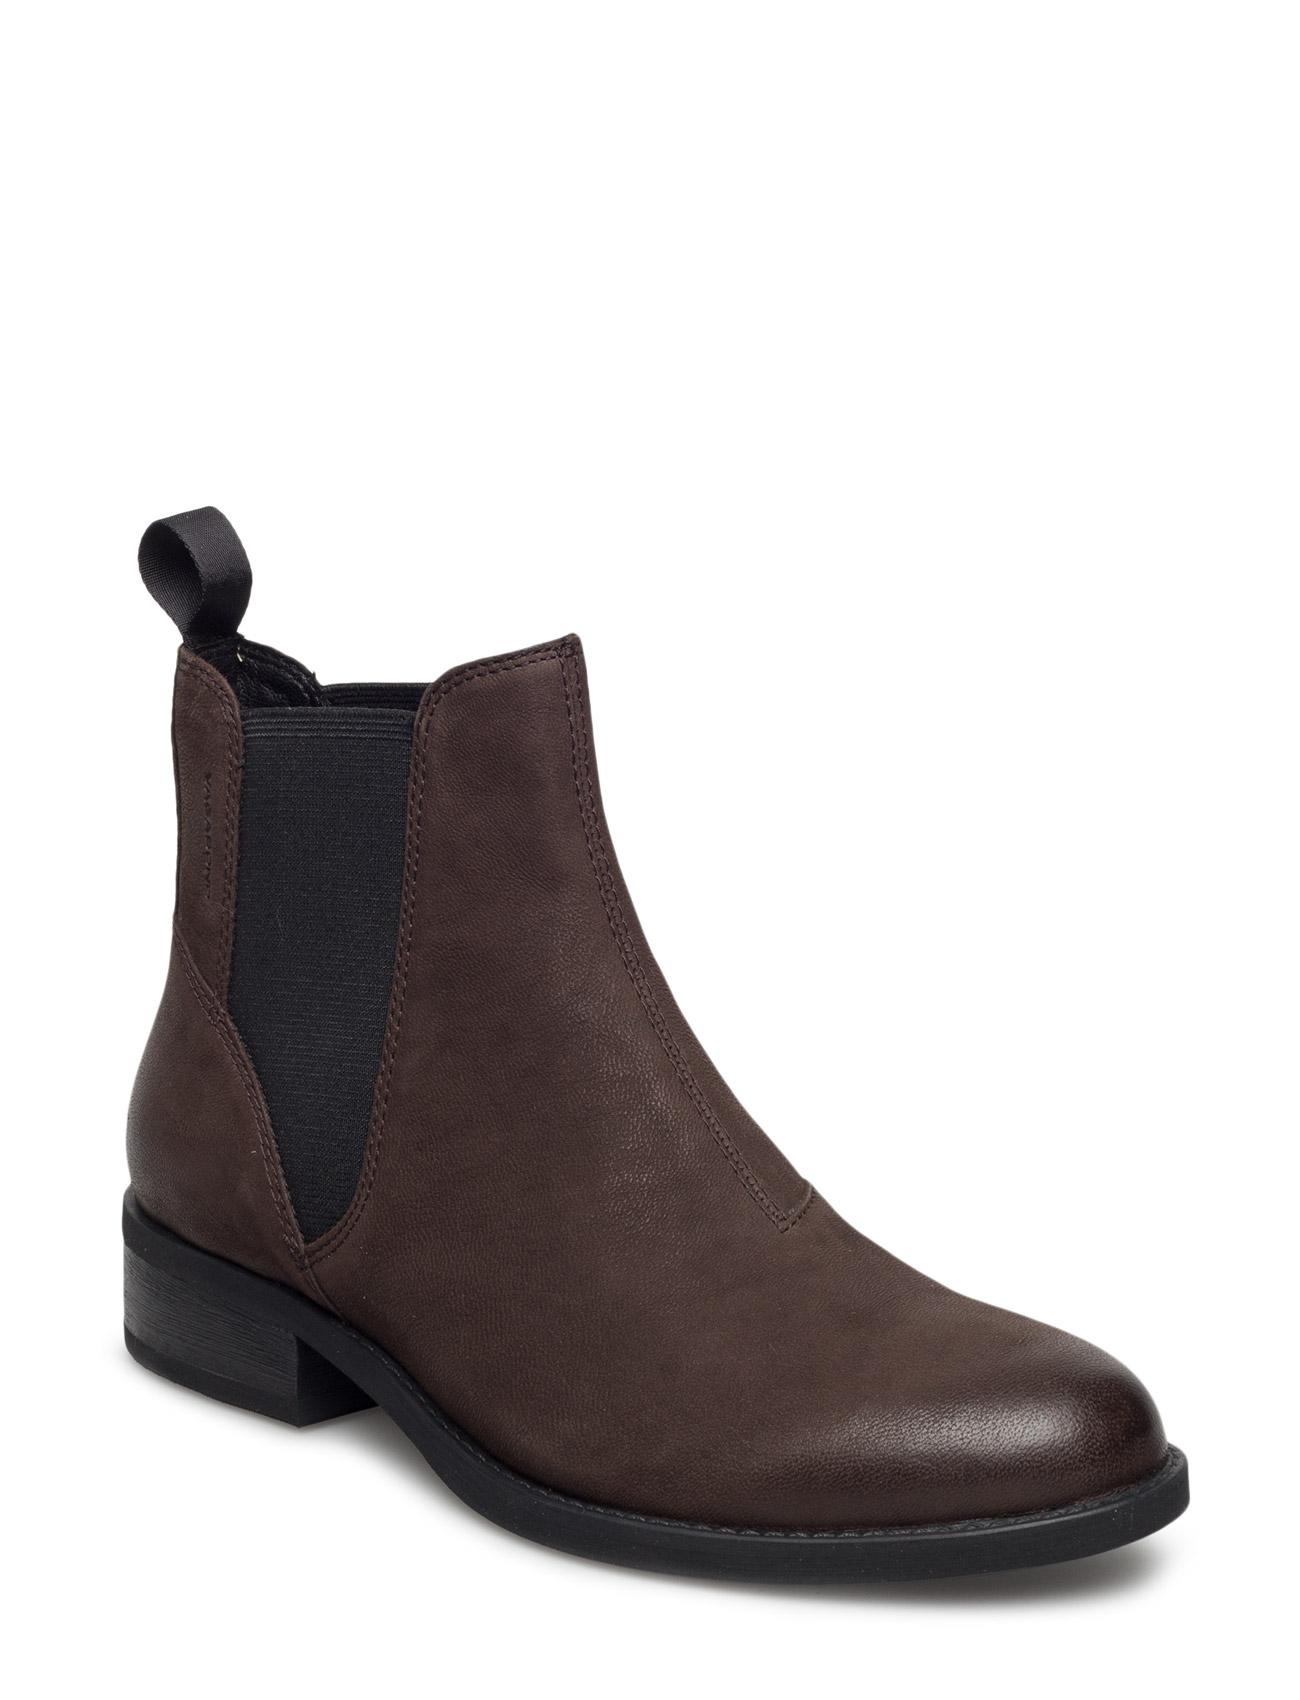 Cary VAGABOND Støvler til Kvinder i